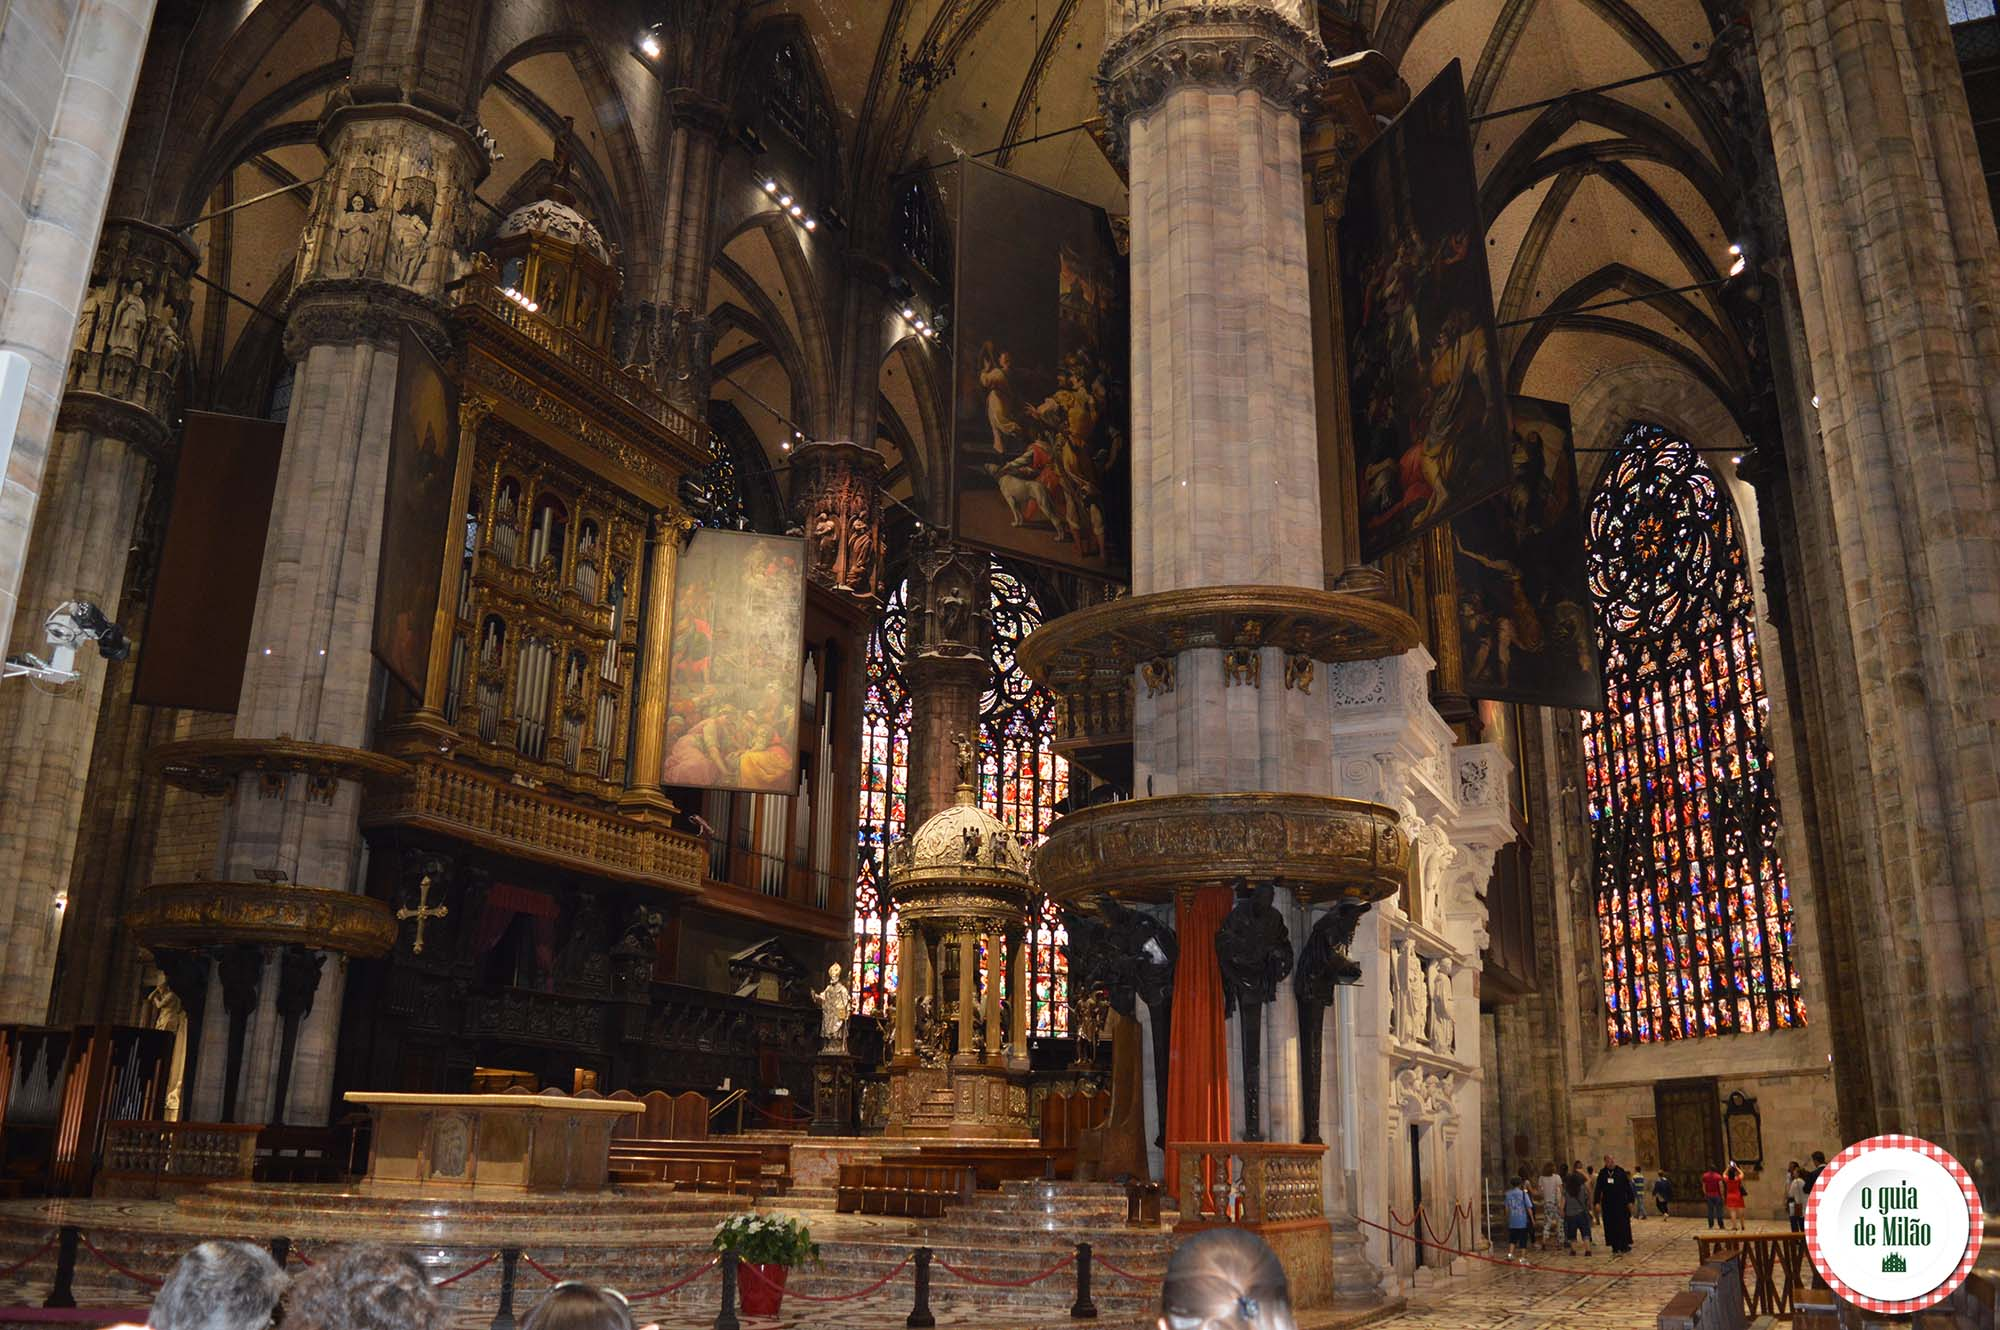 Duomo de Milao